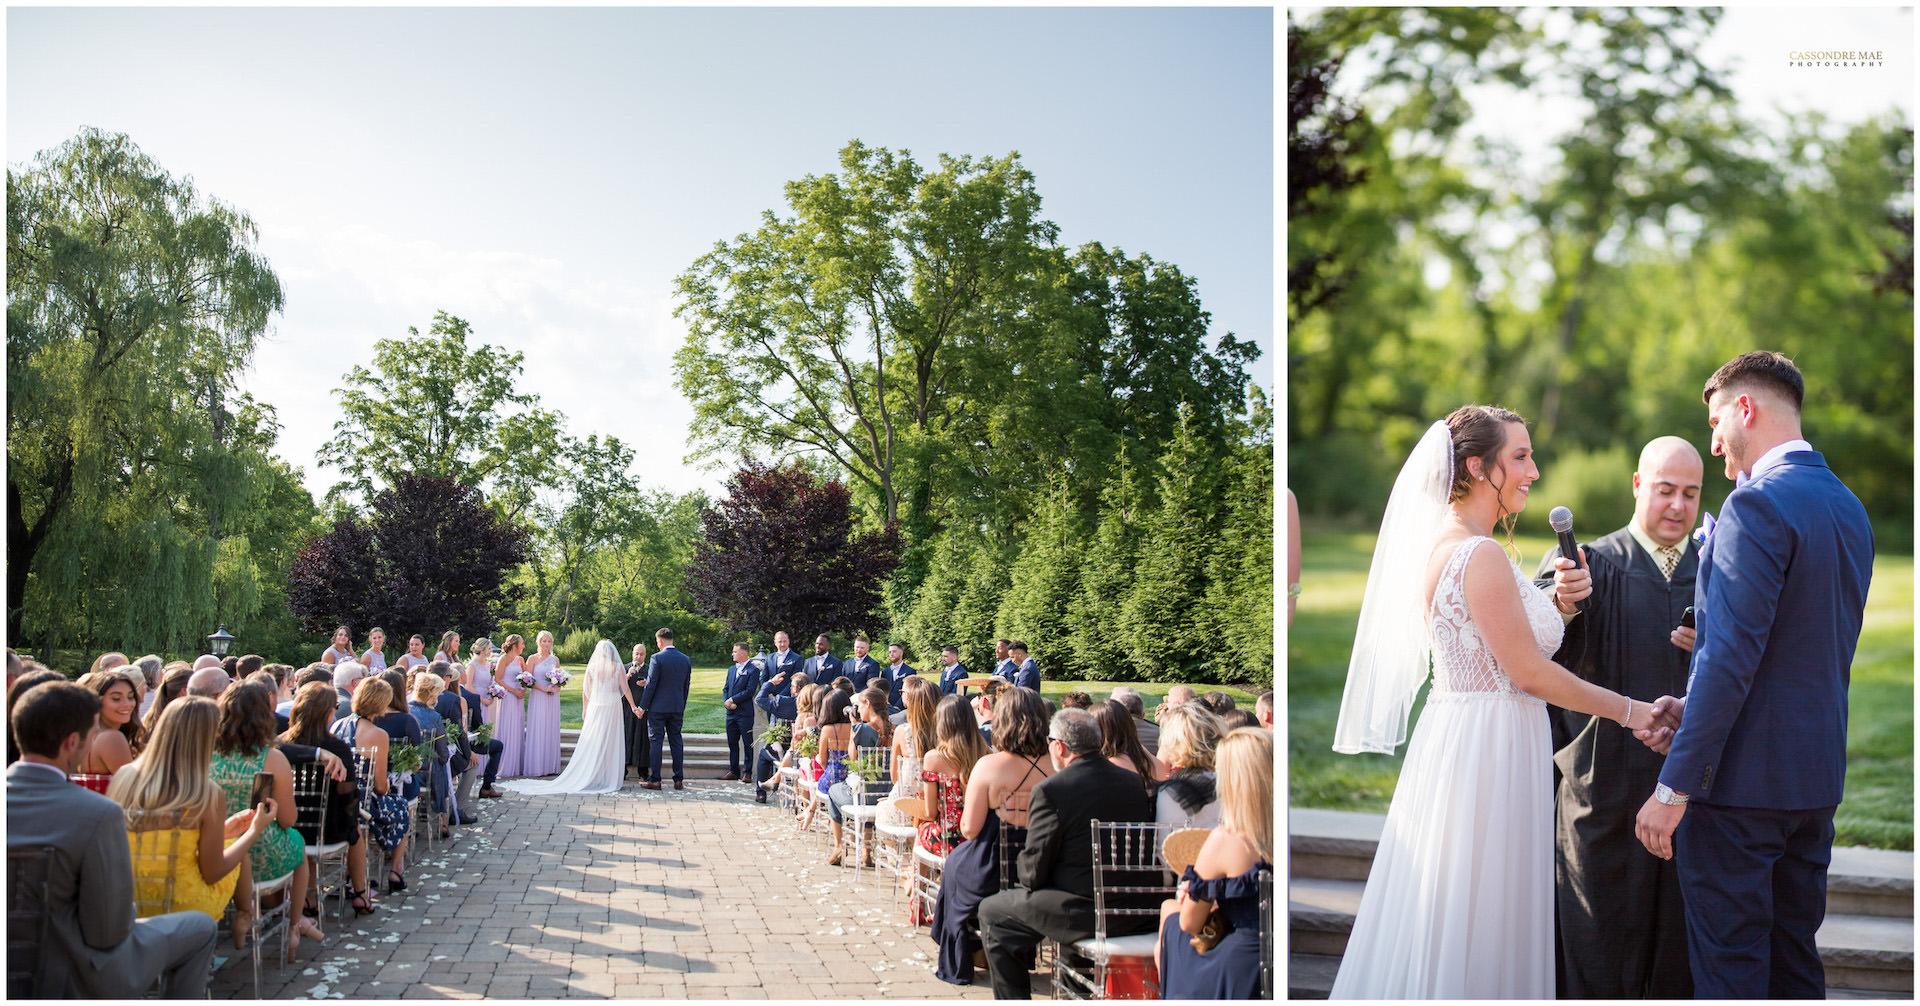 Cassondre Mae Photography Villa Venezia Wedding Photographer 12.jpg